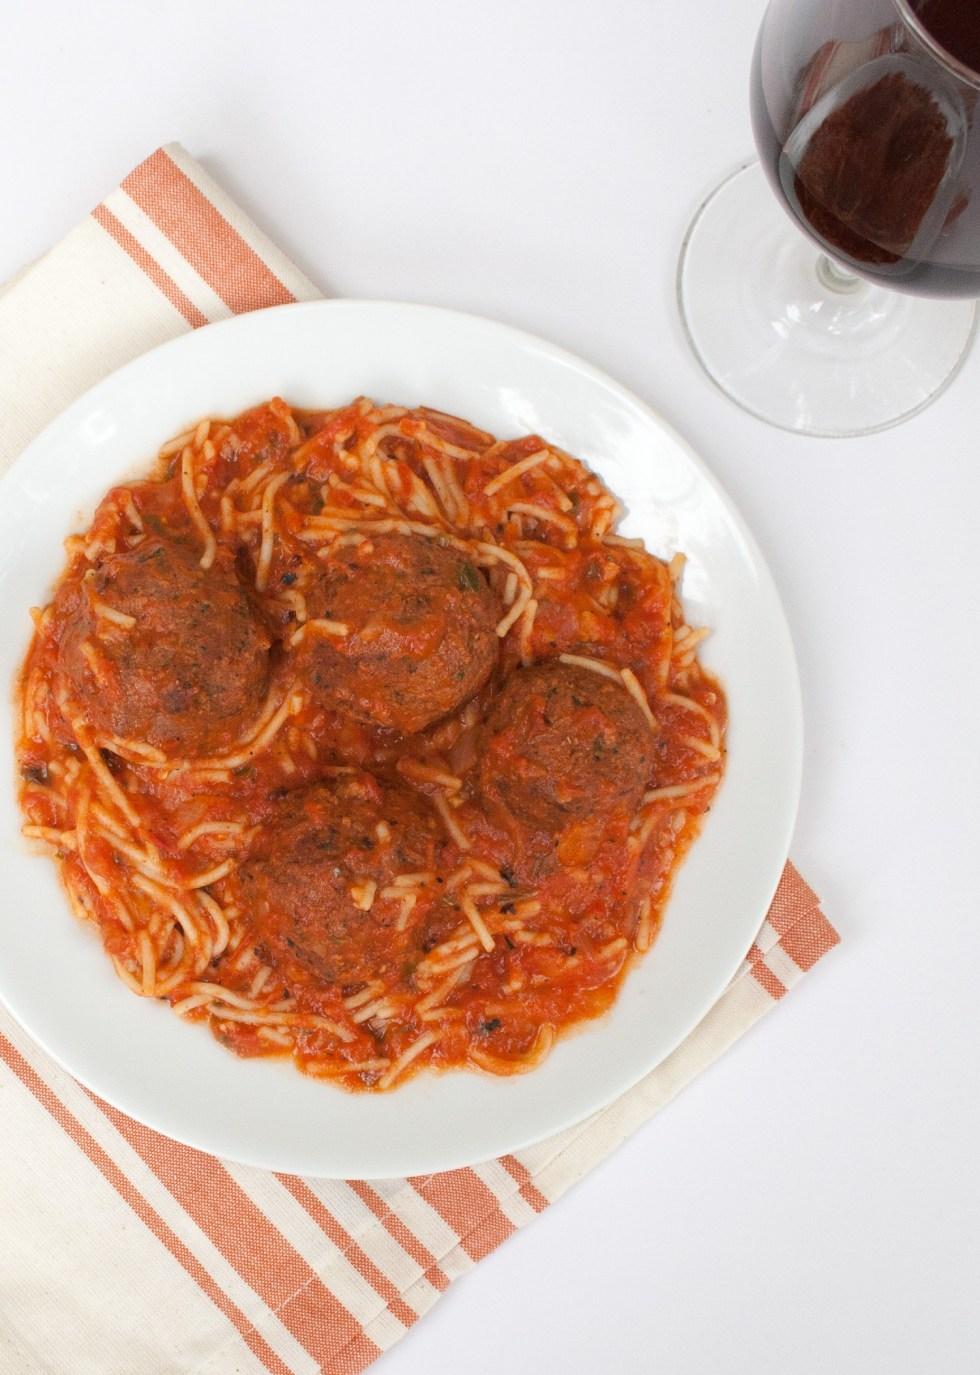 Spaghetti with Vegan Meatballs (gluten free, vegan) - This easy gluten free spaghetti uses pantry staples, including vegan meatballs that taste like pizza!